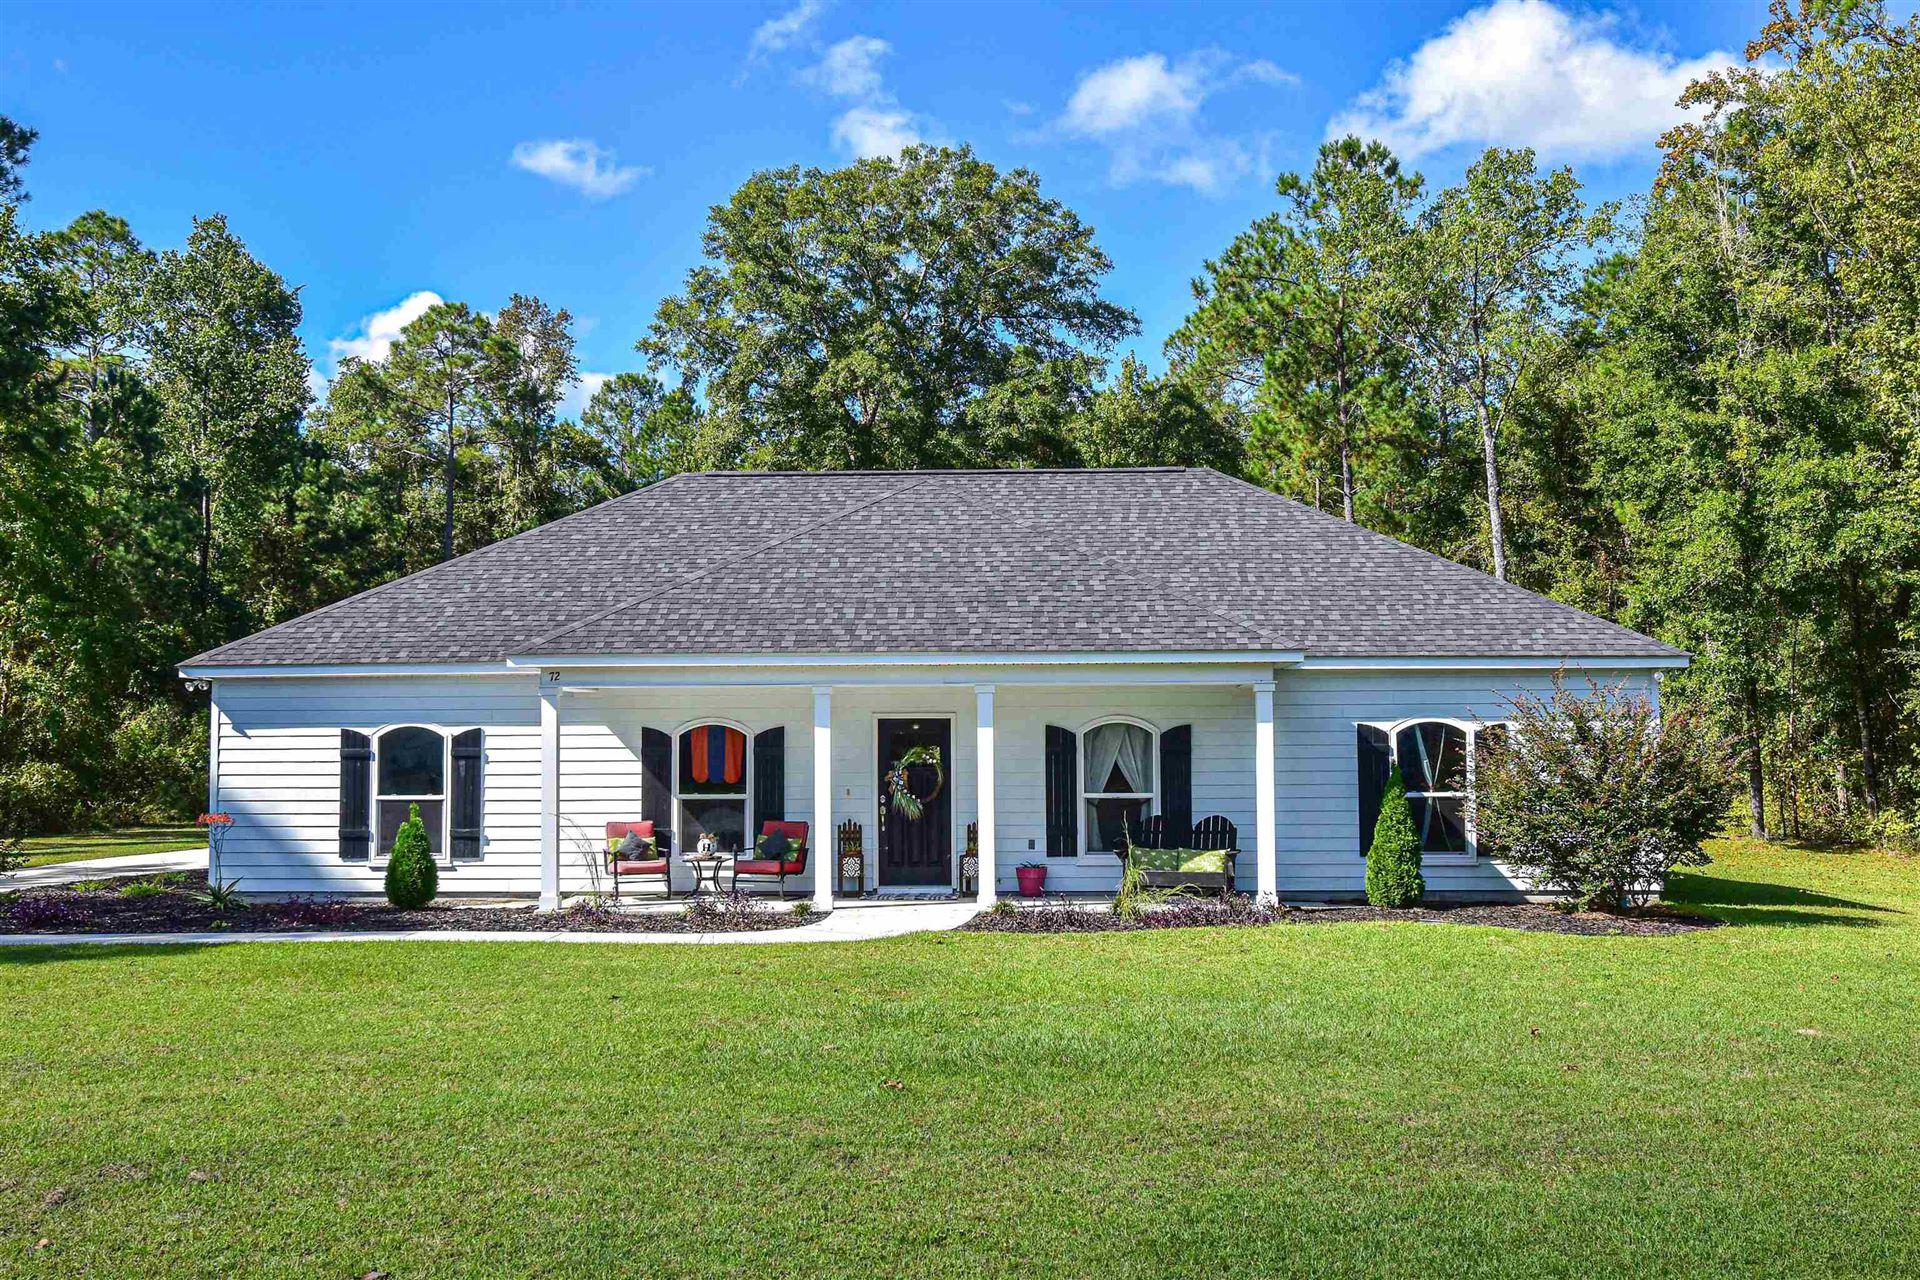 72 Sawmill Court, Crawfordville, FL 32327 - MLS#: 338324